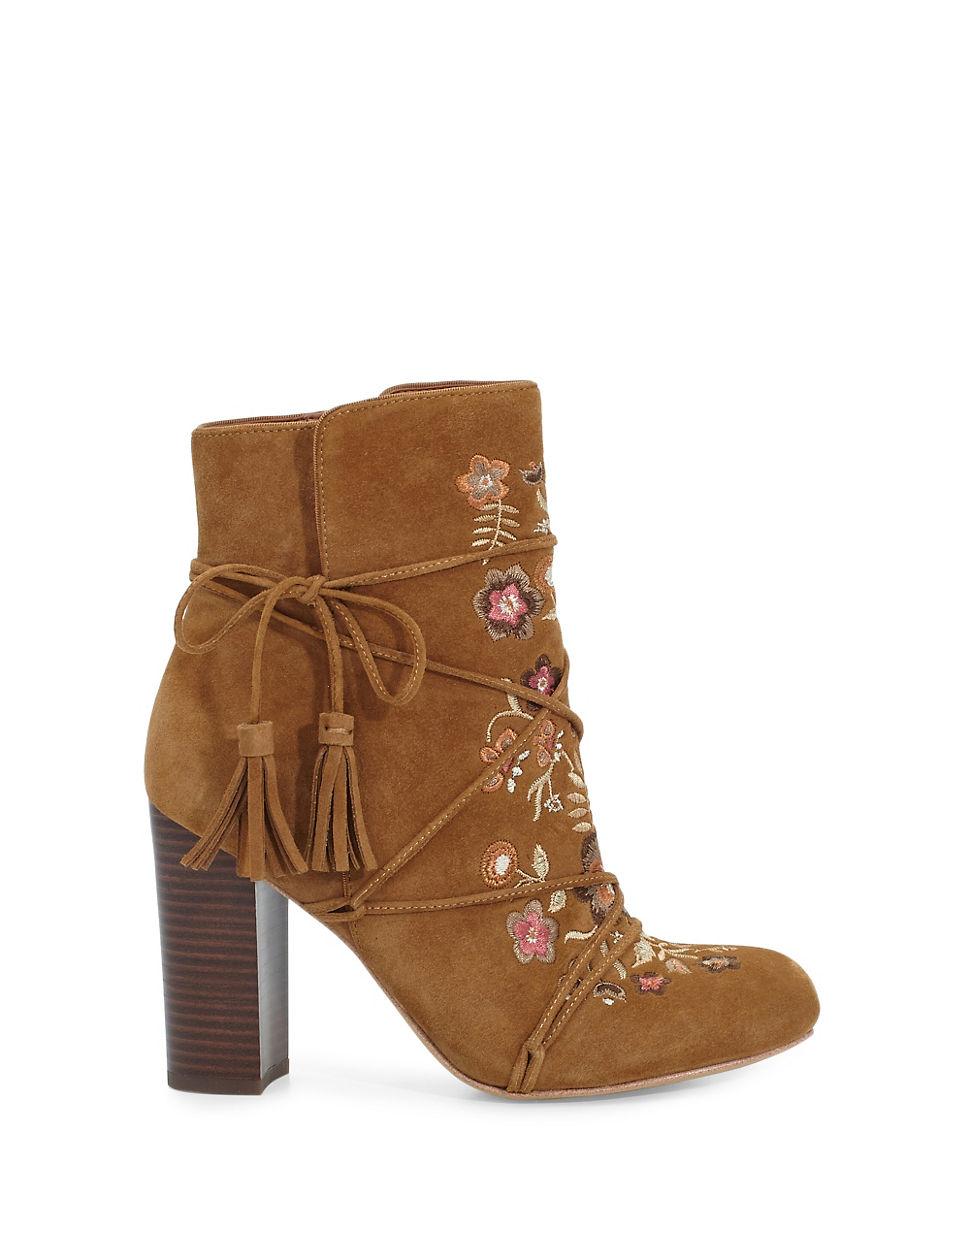 714c1debf53802 Lyst - Sam Edelman Winnie Tassel Leather Booties in Brown